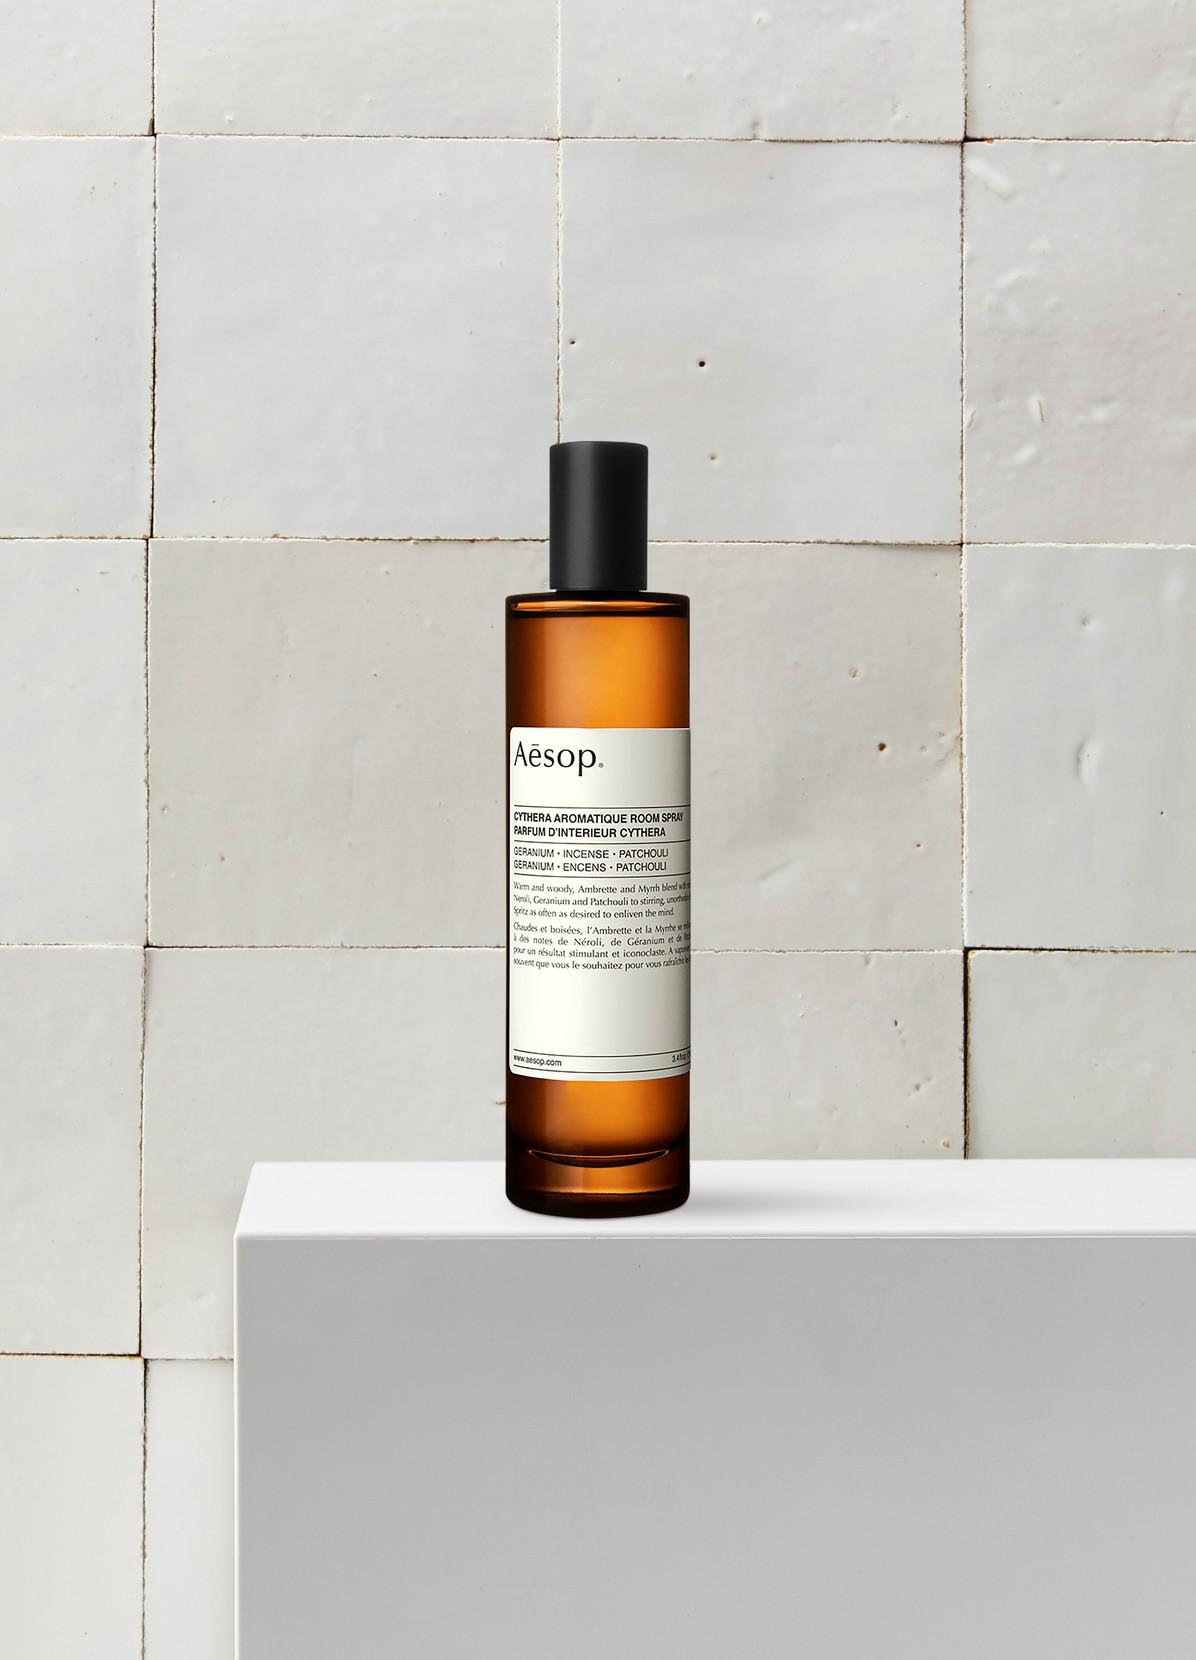 AESOPCythera aromatique room spray 100 ml